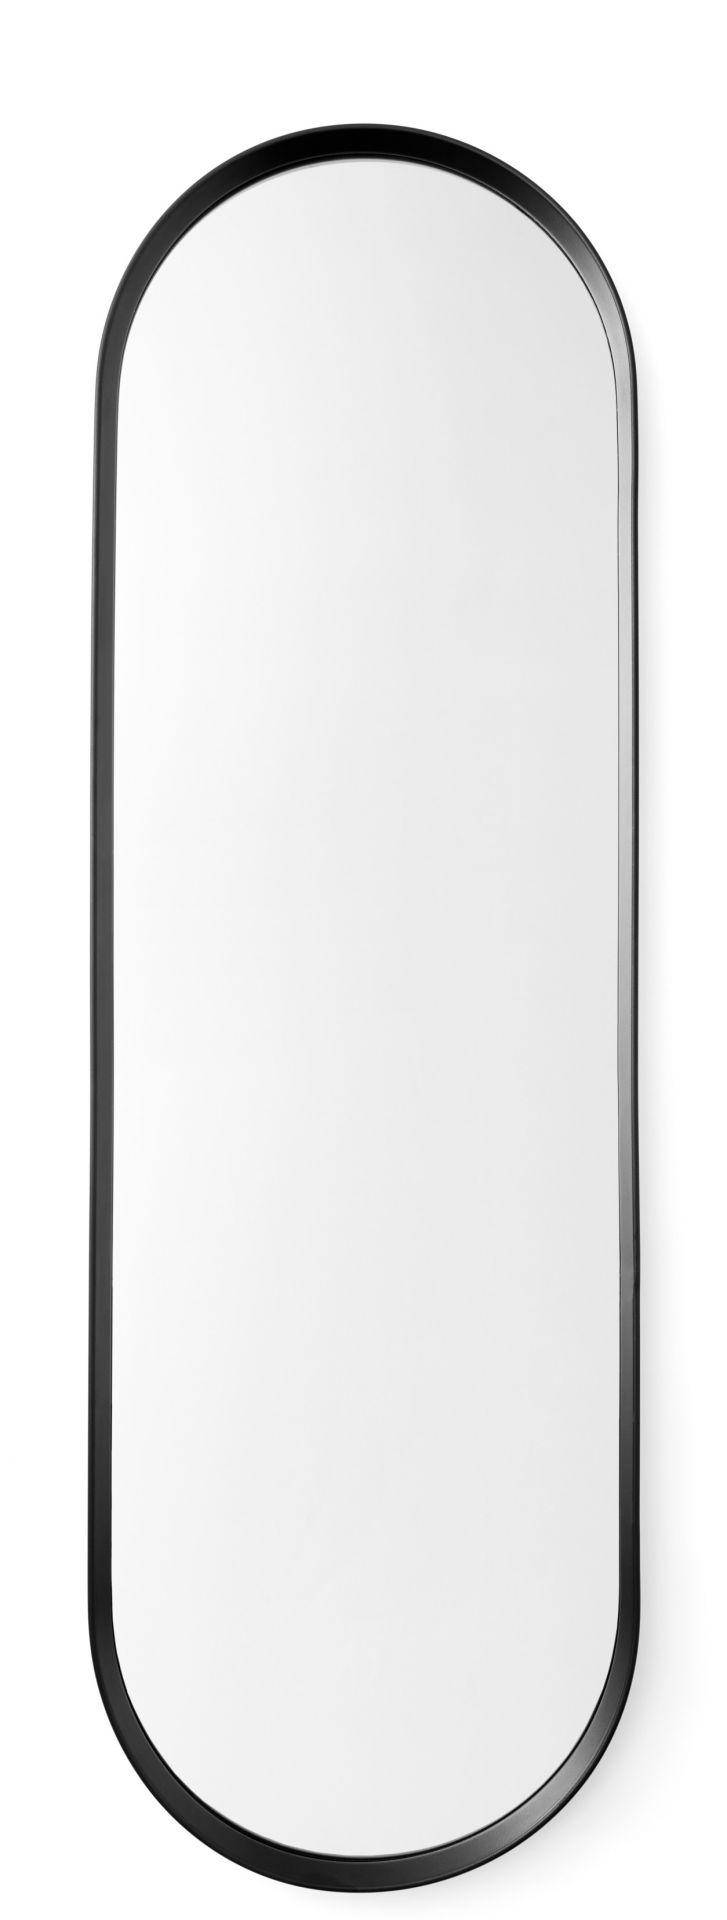 Norm Wall Mirror Oval Wandspiegel Menu